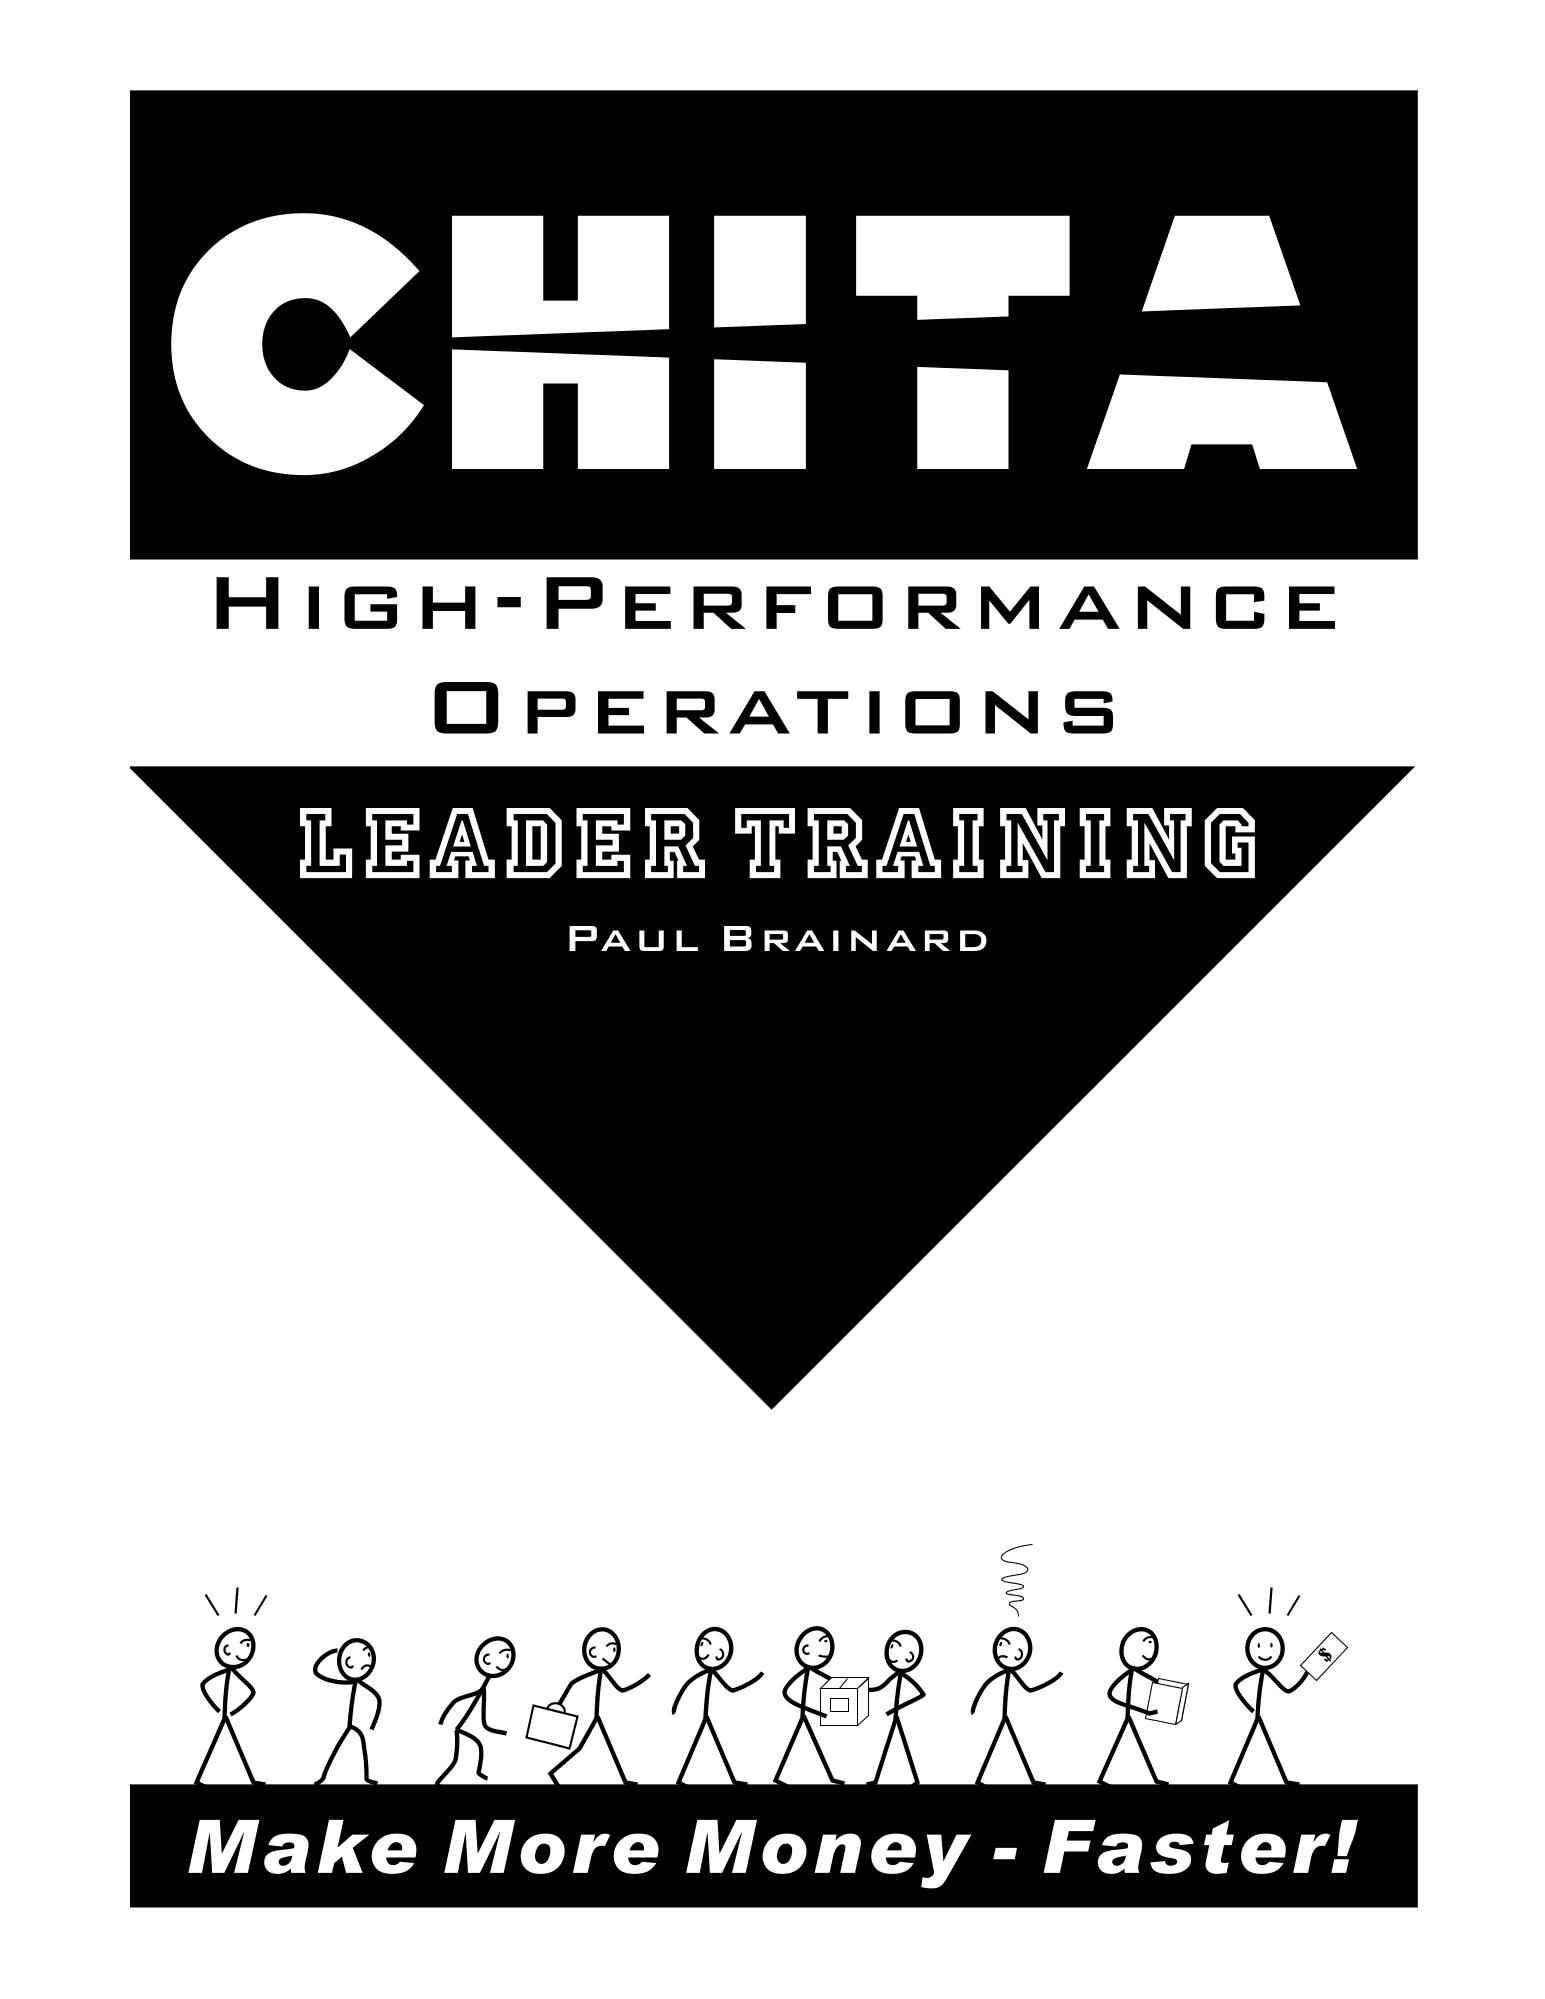 CHITA High-Performance Operations Leader Training